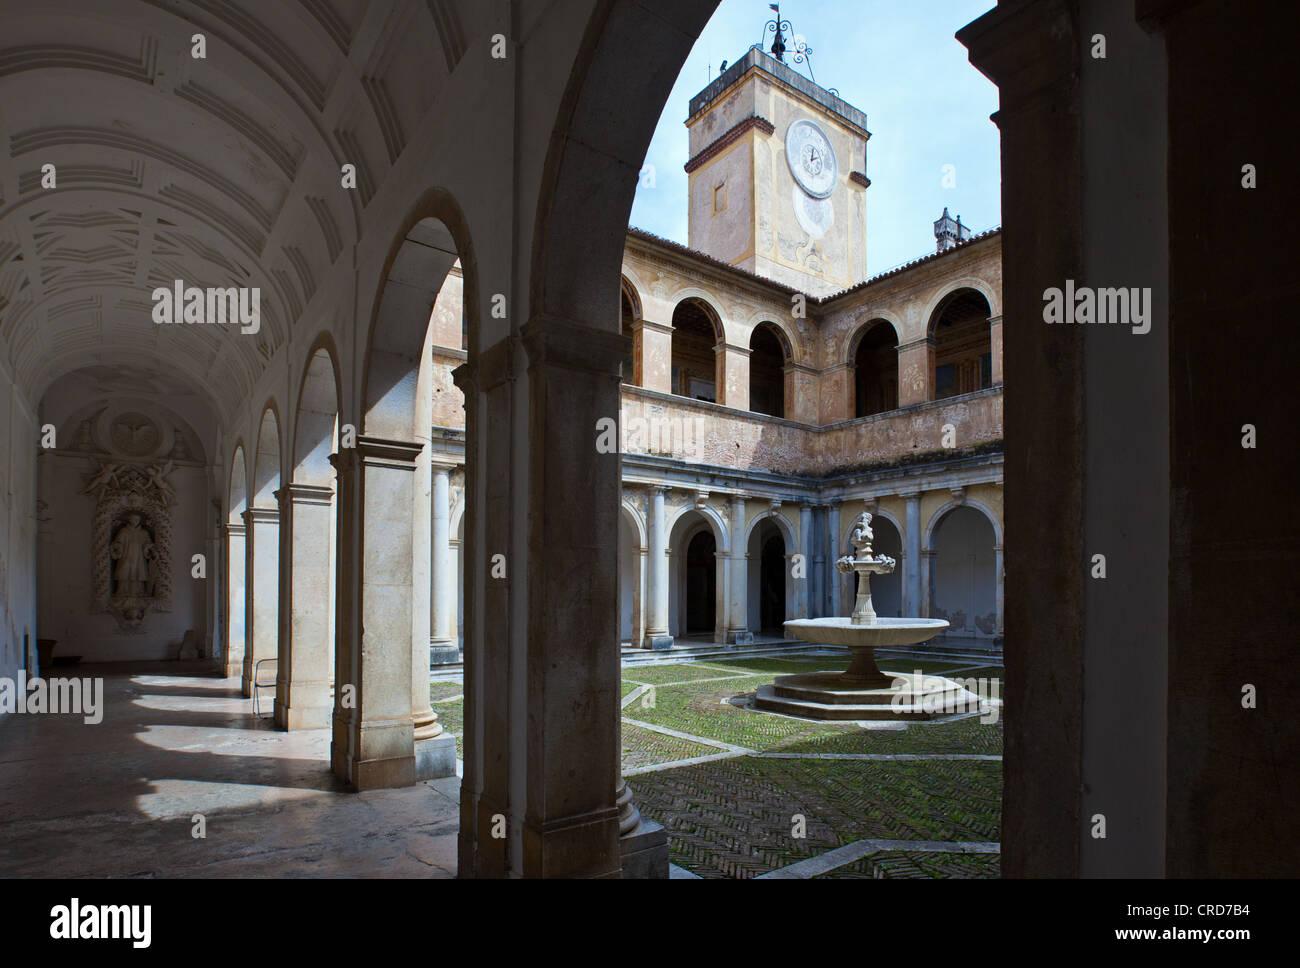 Europe Italy,Campania Cilento, Padula, the Certosa of San Lorenzo Cloister - Stock Image